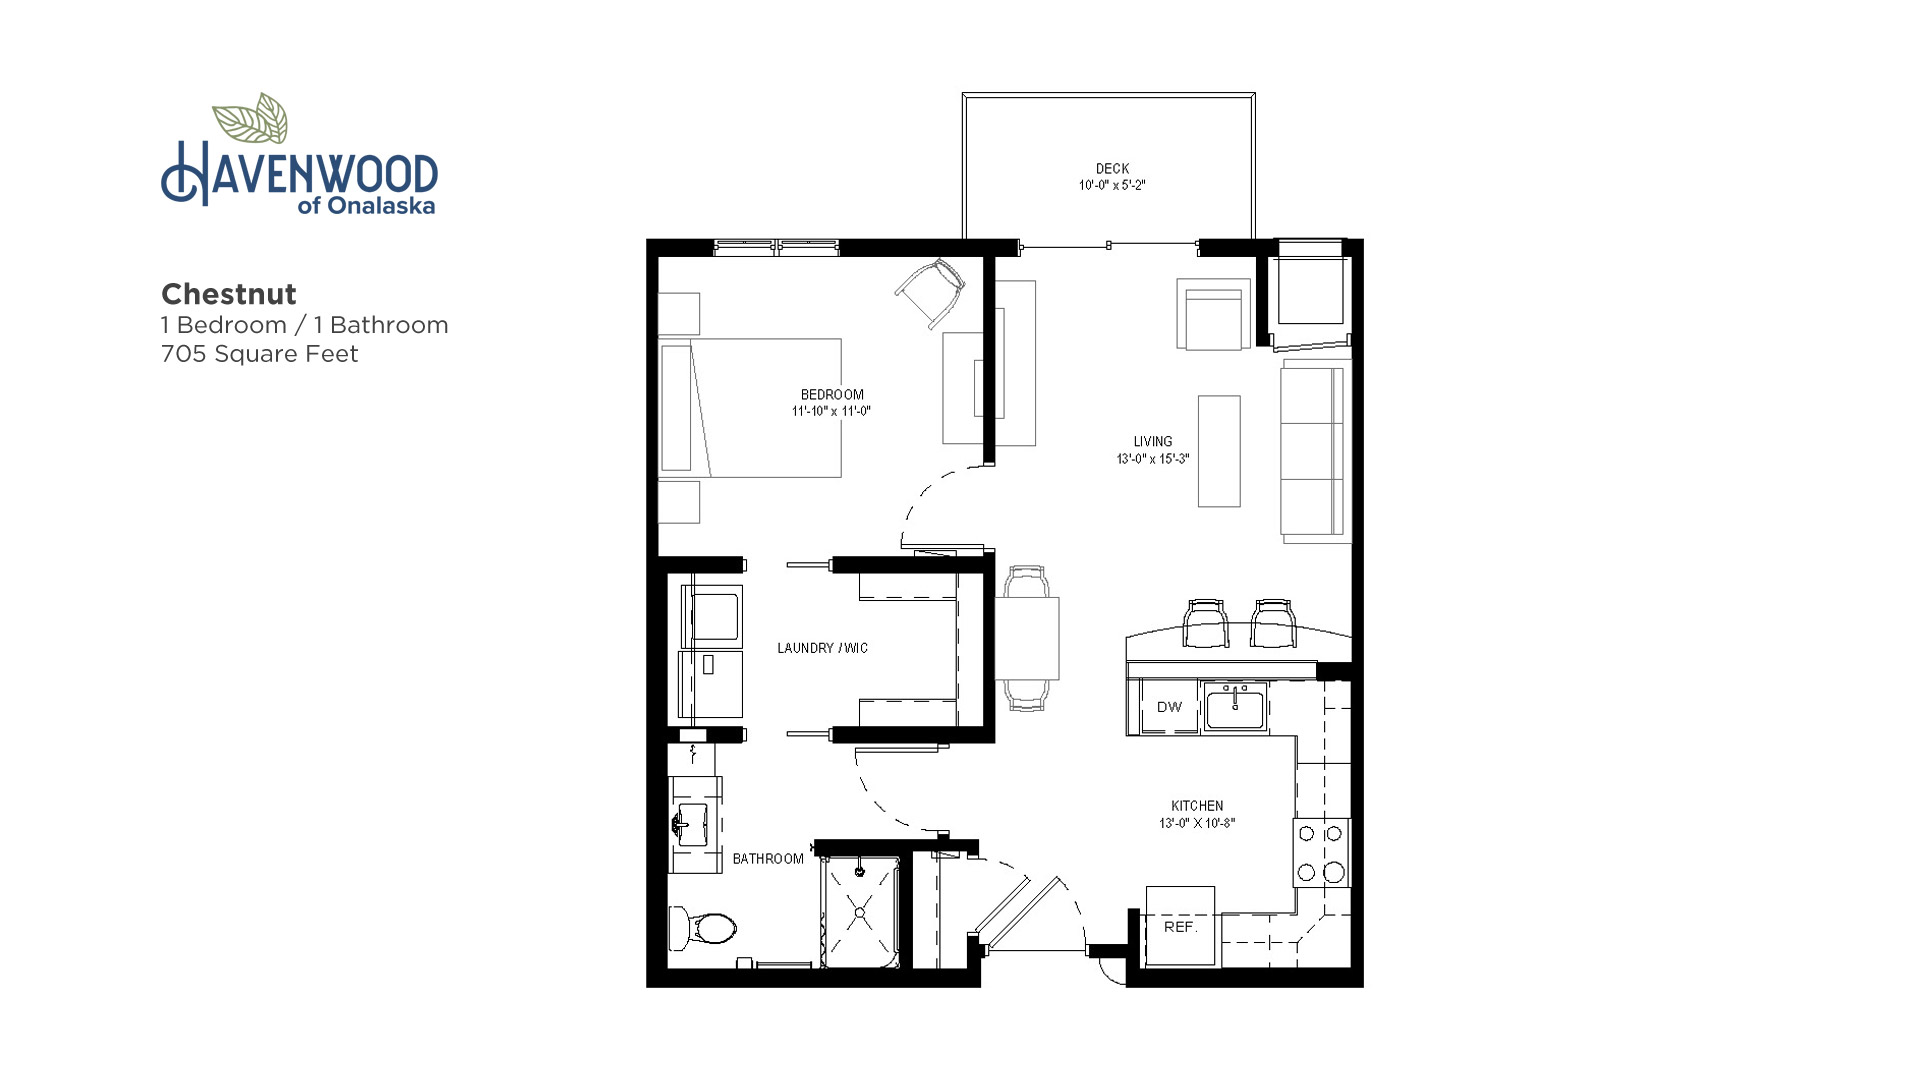 Havenwood of Onalaska Chestnut Floor Plan